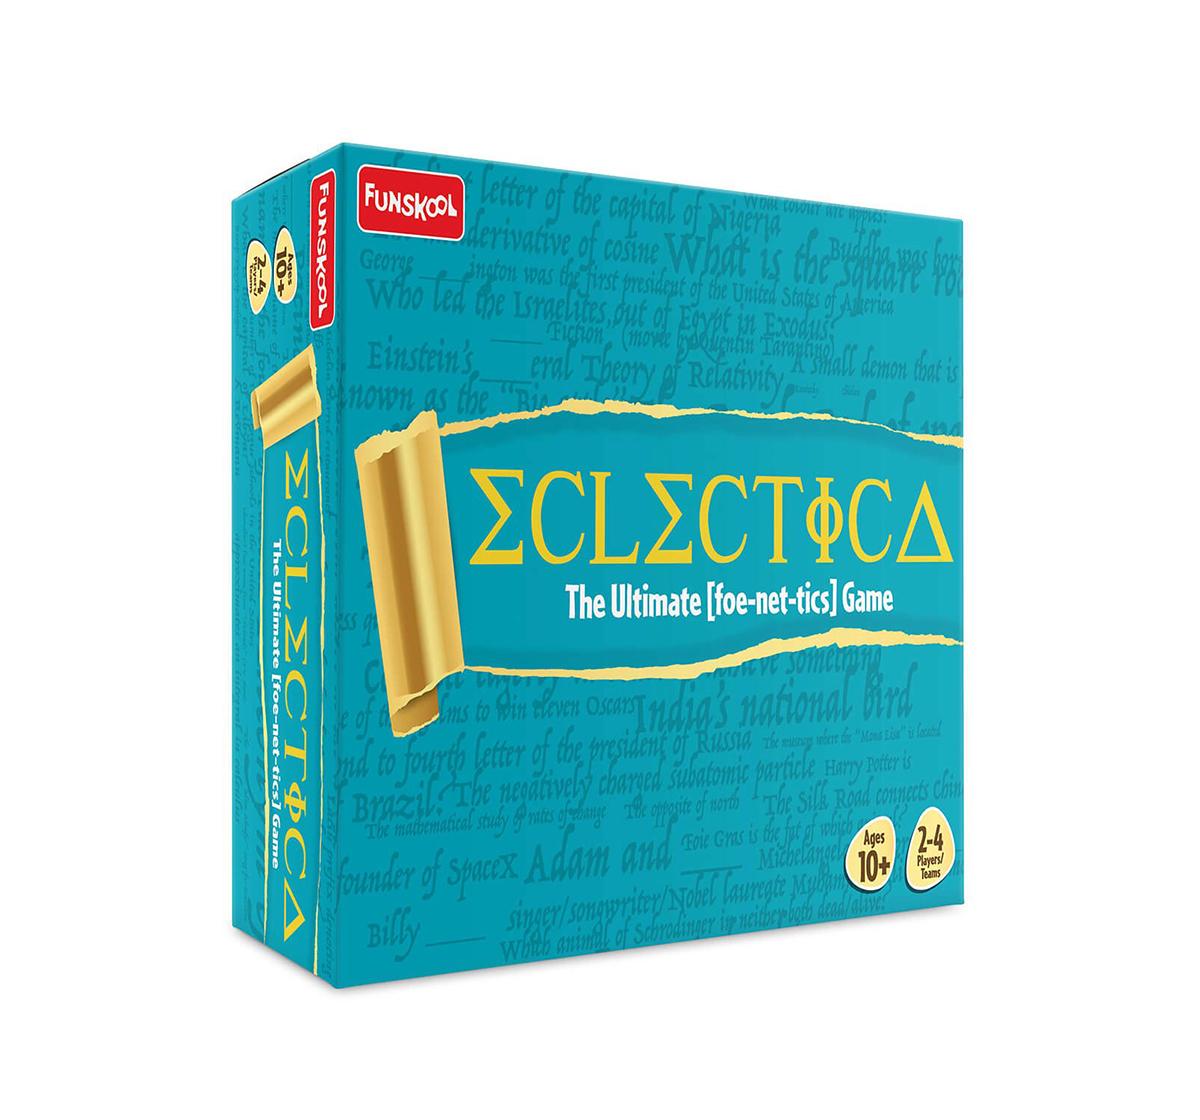 Funskool |  Funskool Games Eclectica (Multi Color) Games for Kids age 10Y+